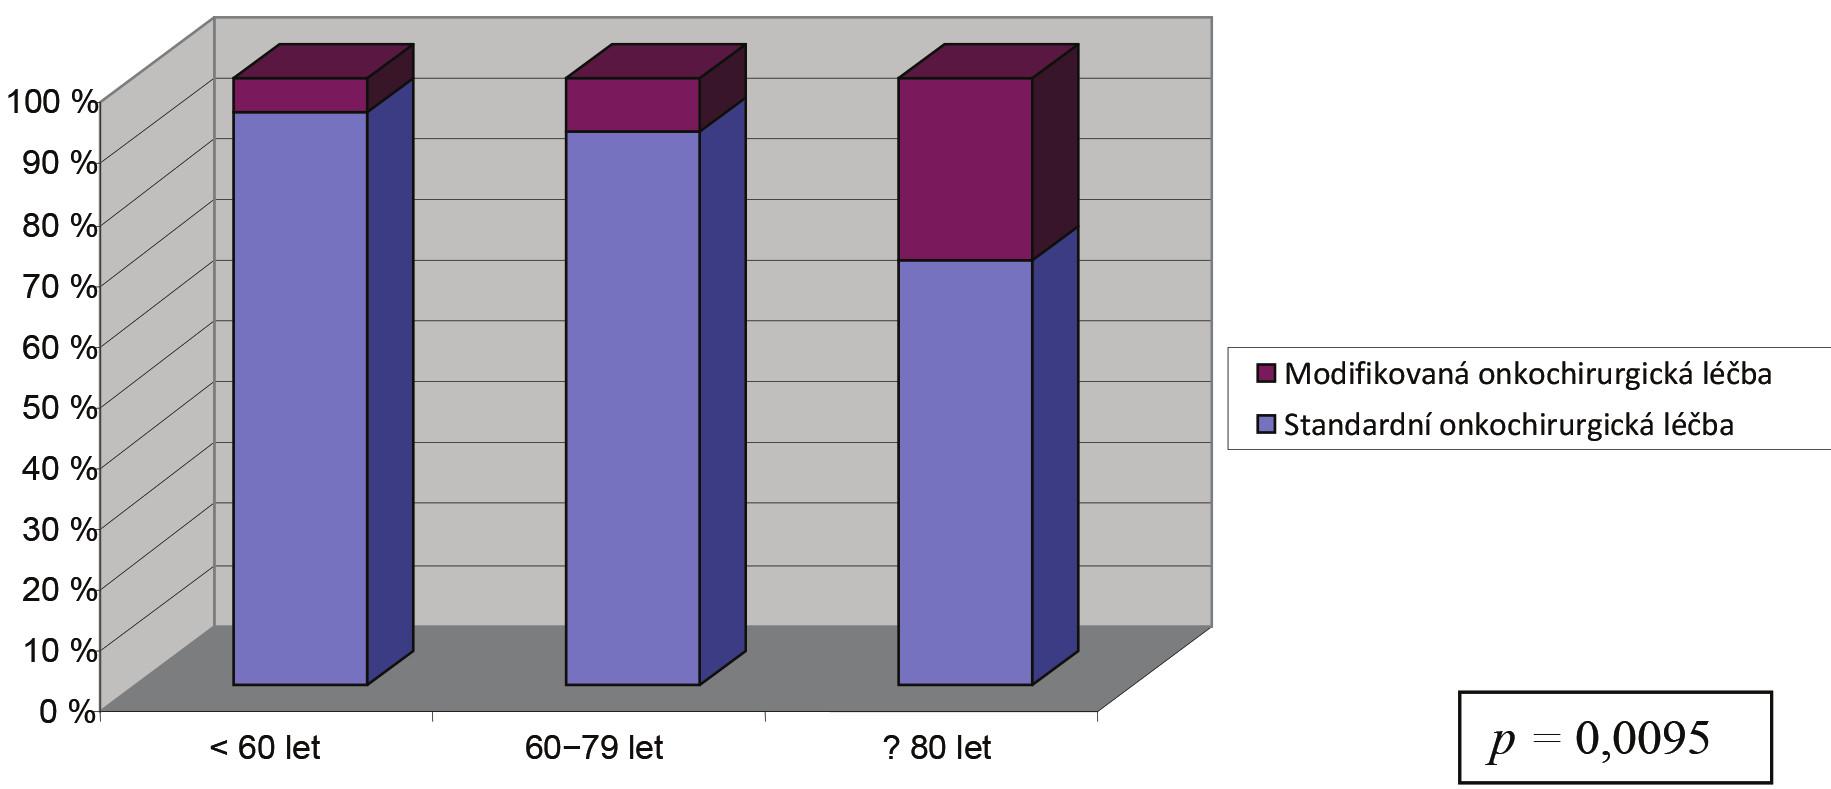 Onkochirurgická léčba Graph 3: Onco-surgical treatment